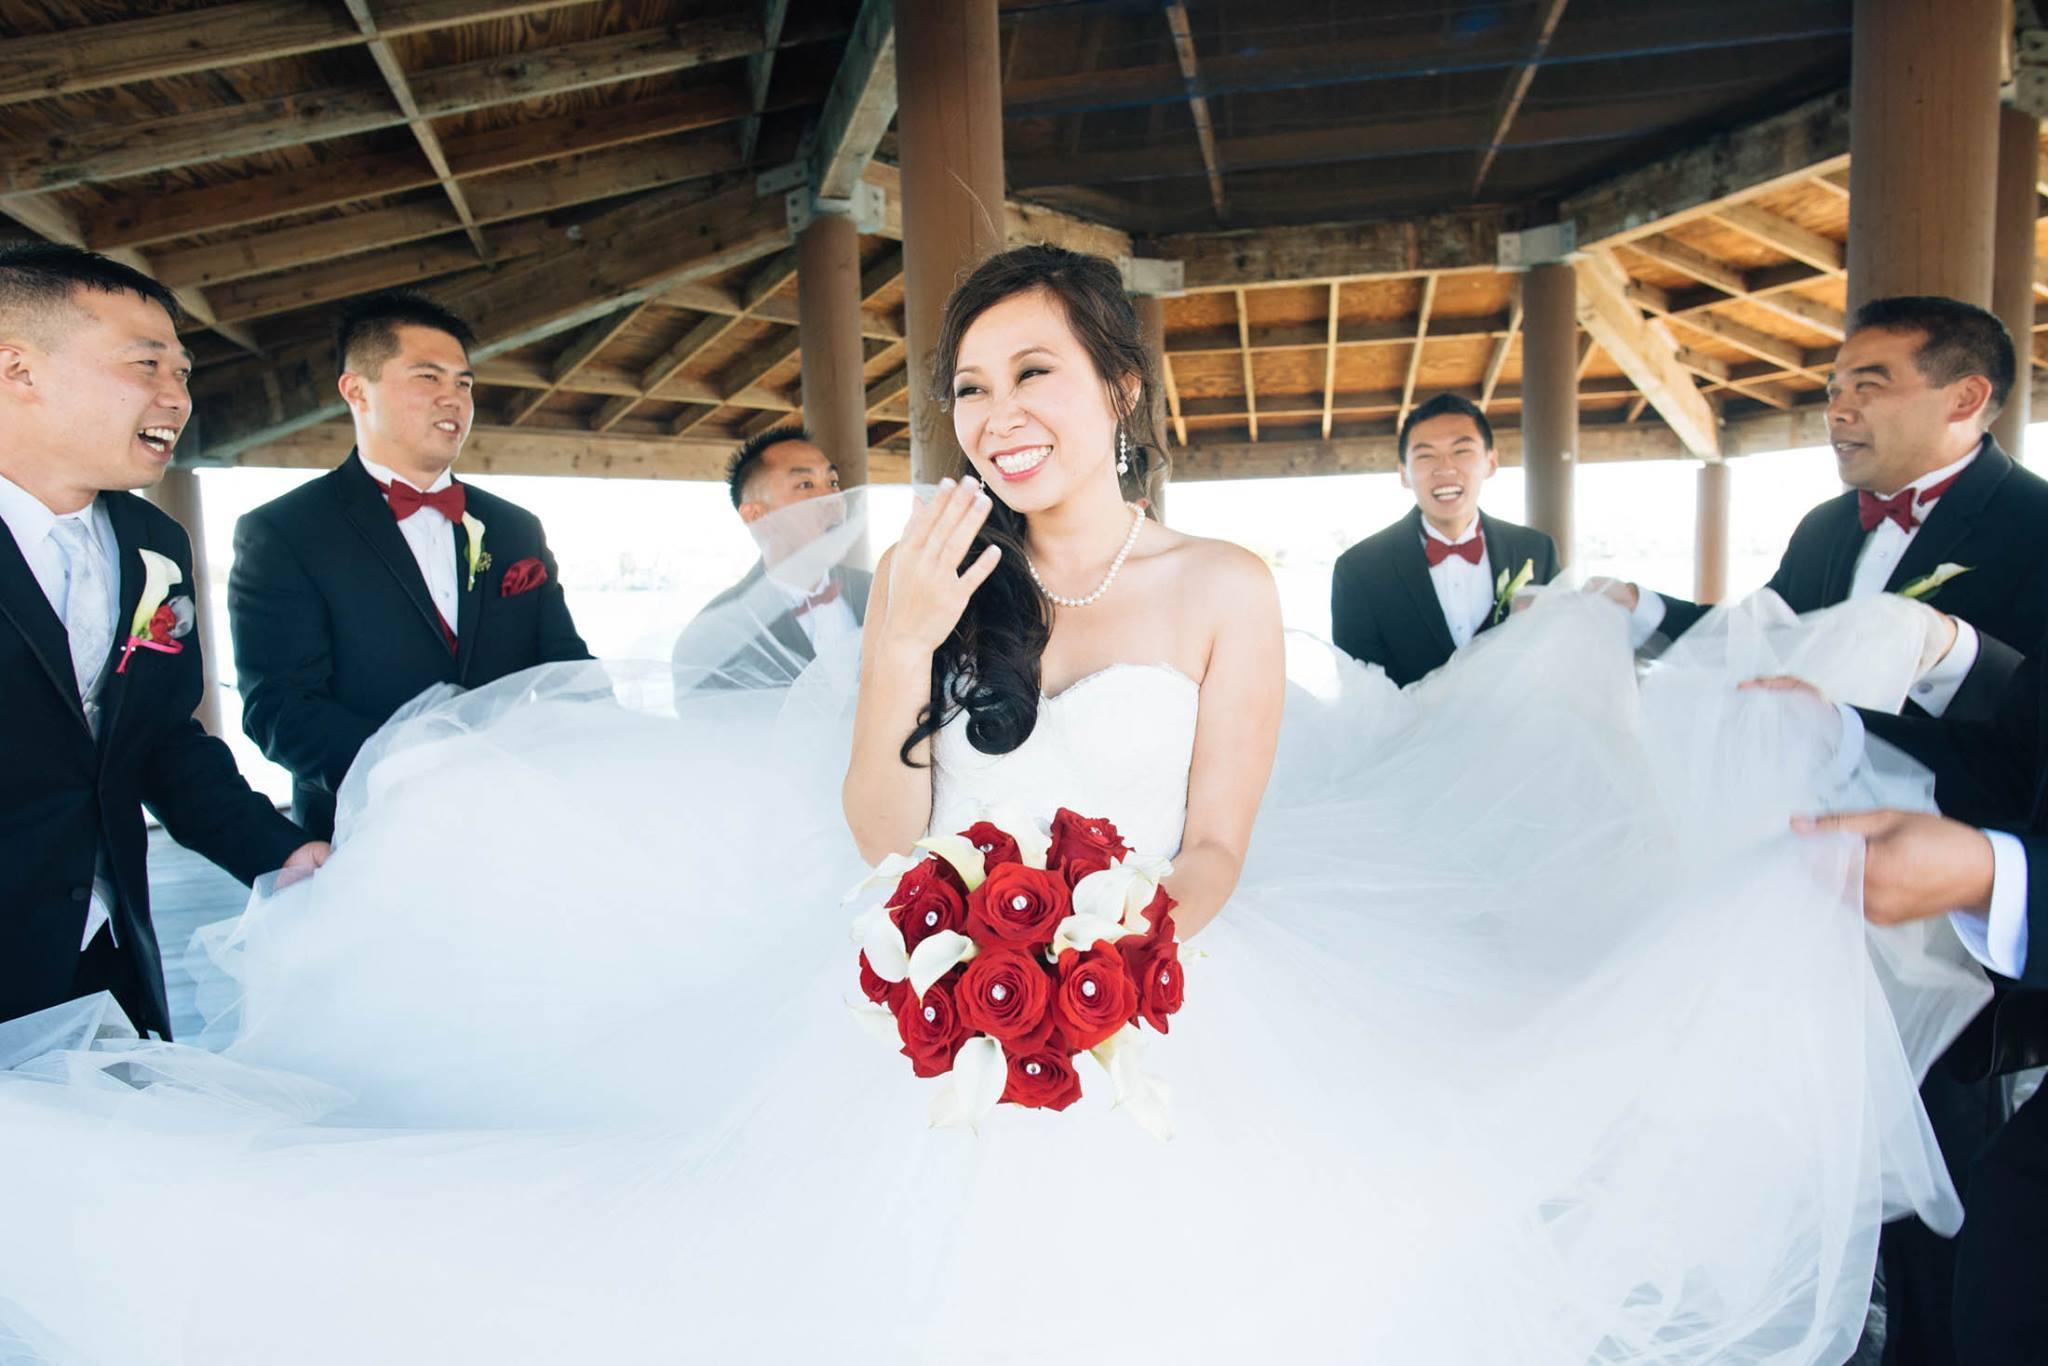 KennyJCStudio - Wedding Day Photography04.jpg